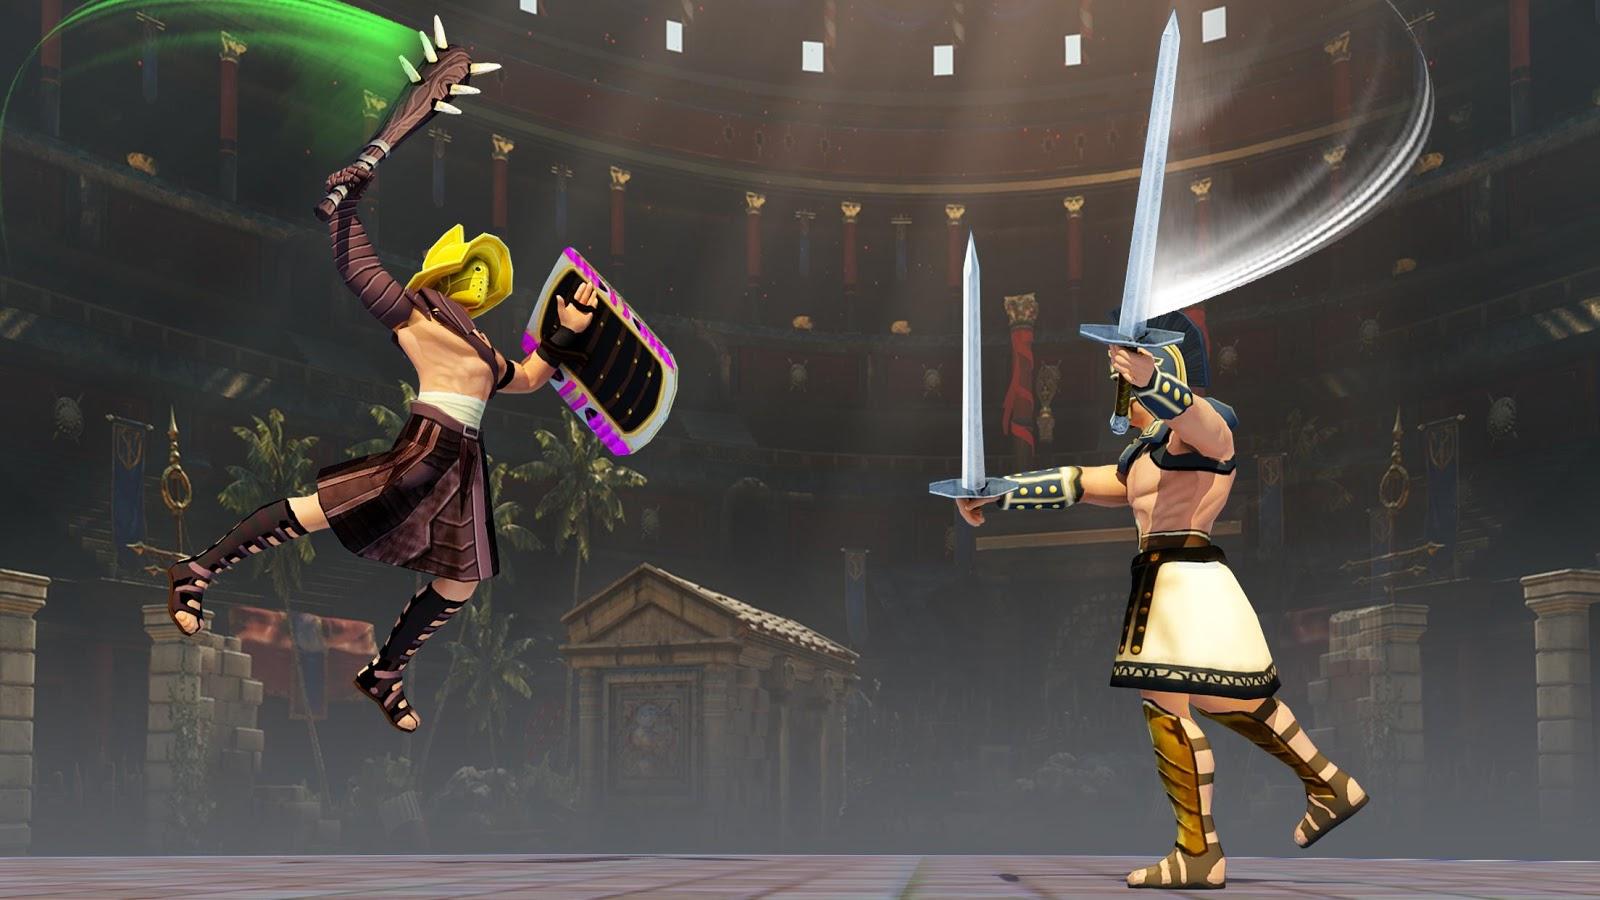 Gladiators Medieval Arena: Knights Fighting Glory 1 2 APK